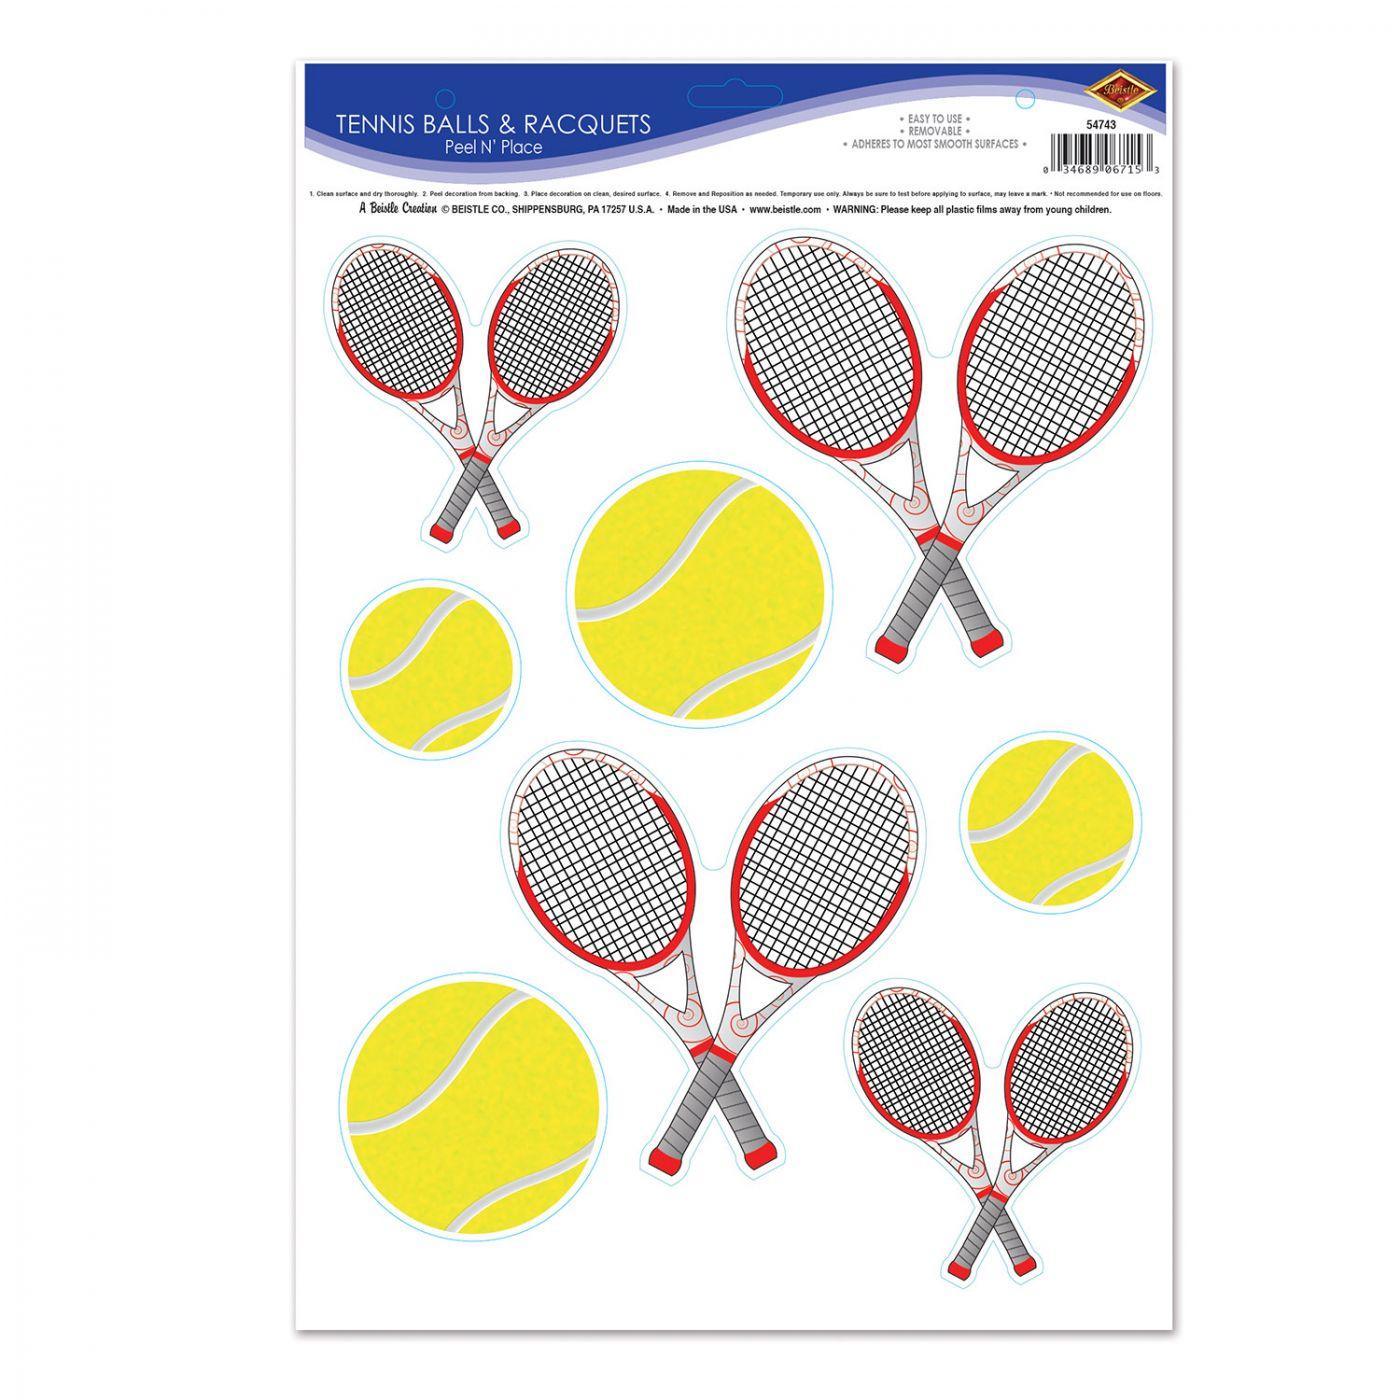 Tennis Balls & Racquets Peel 'N Place image